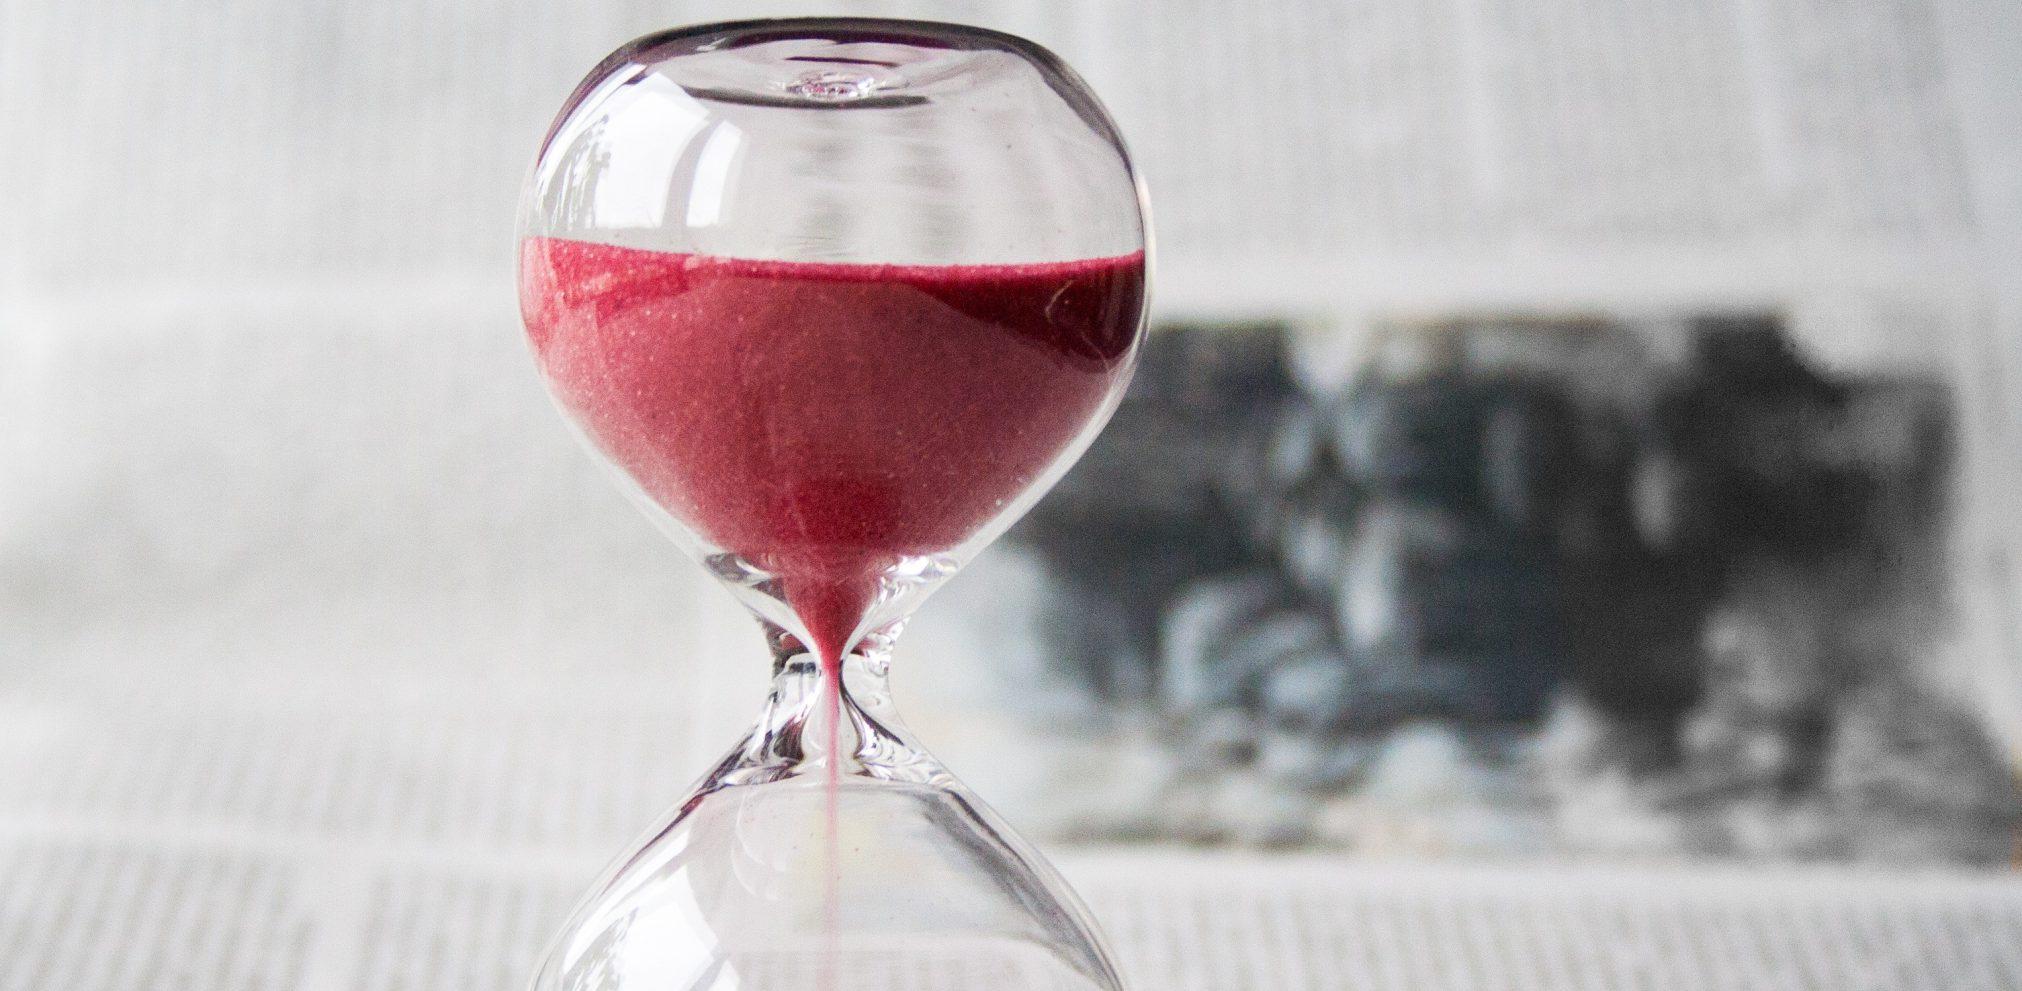 hourglass-620397-Copy-2